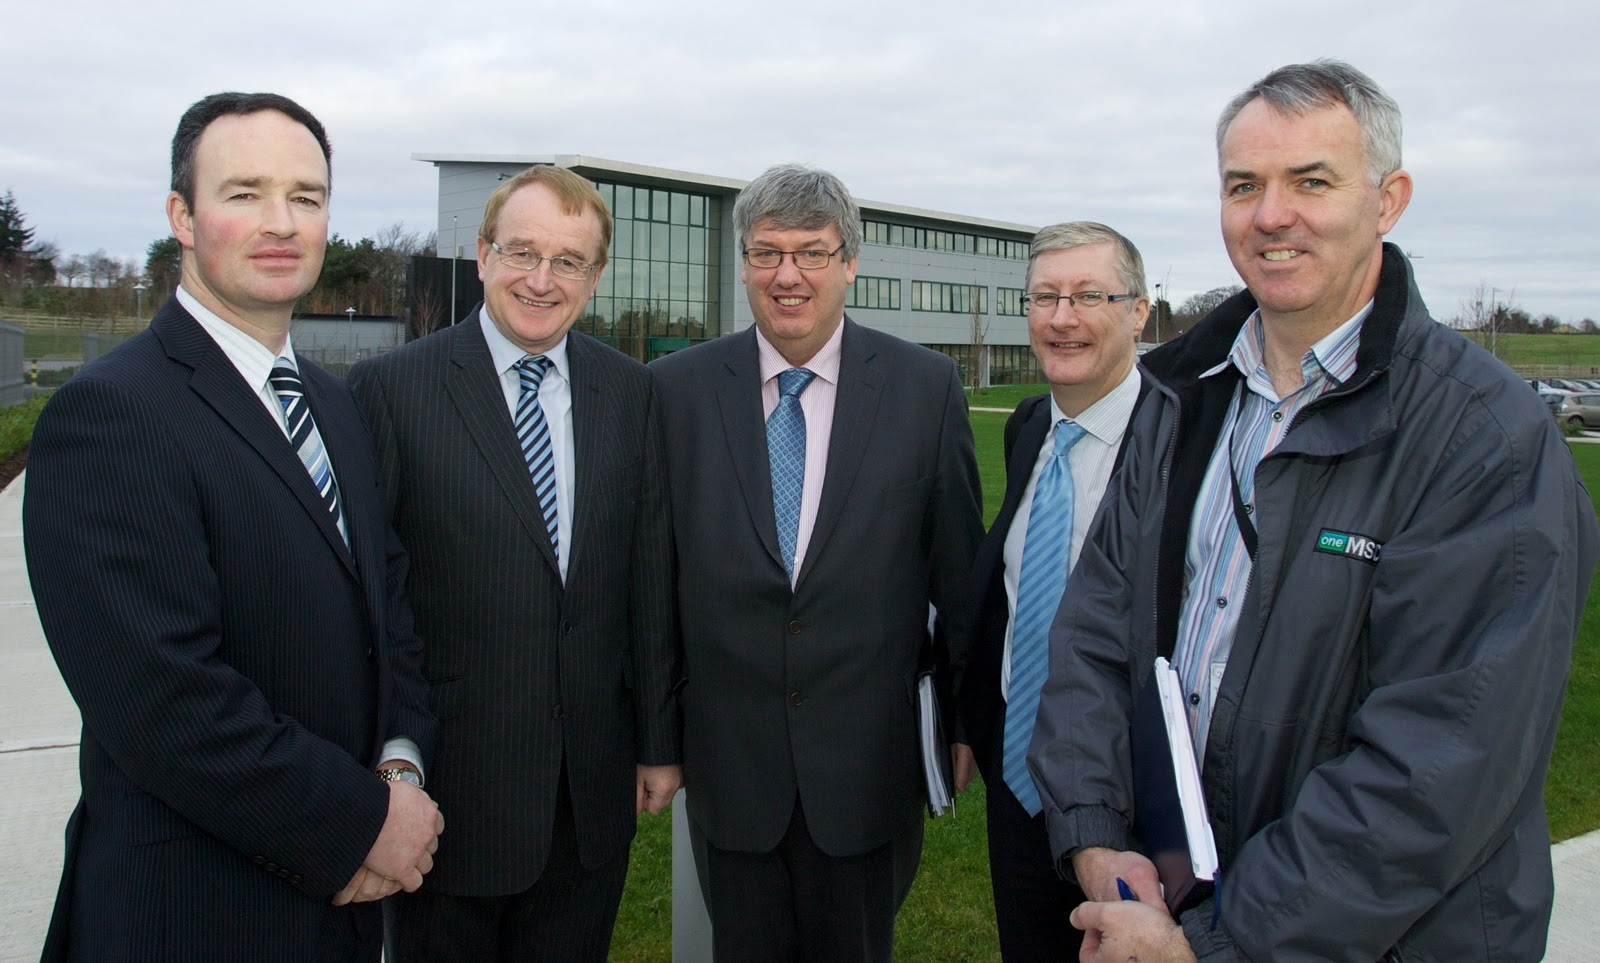 A President's Blog by PJ Rudden: February 2012